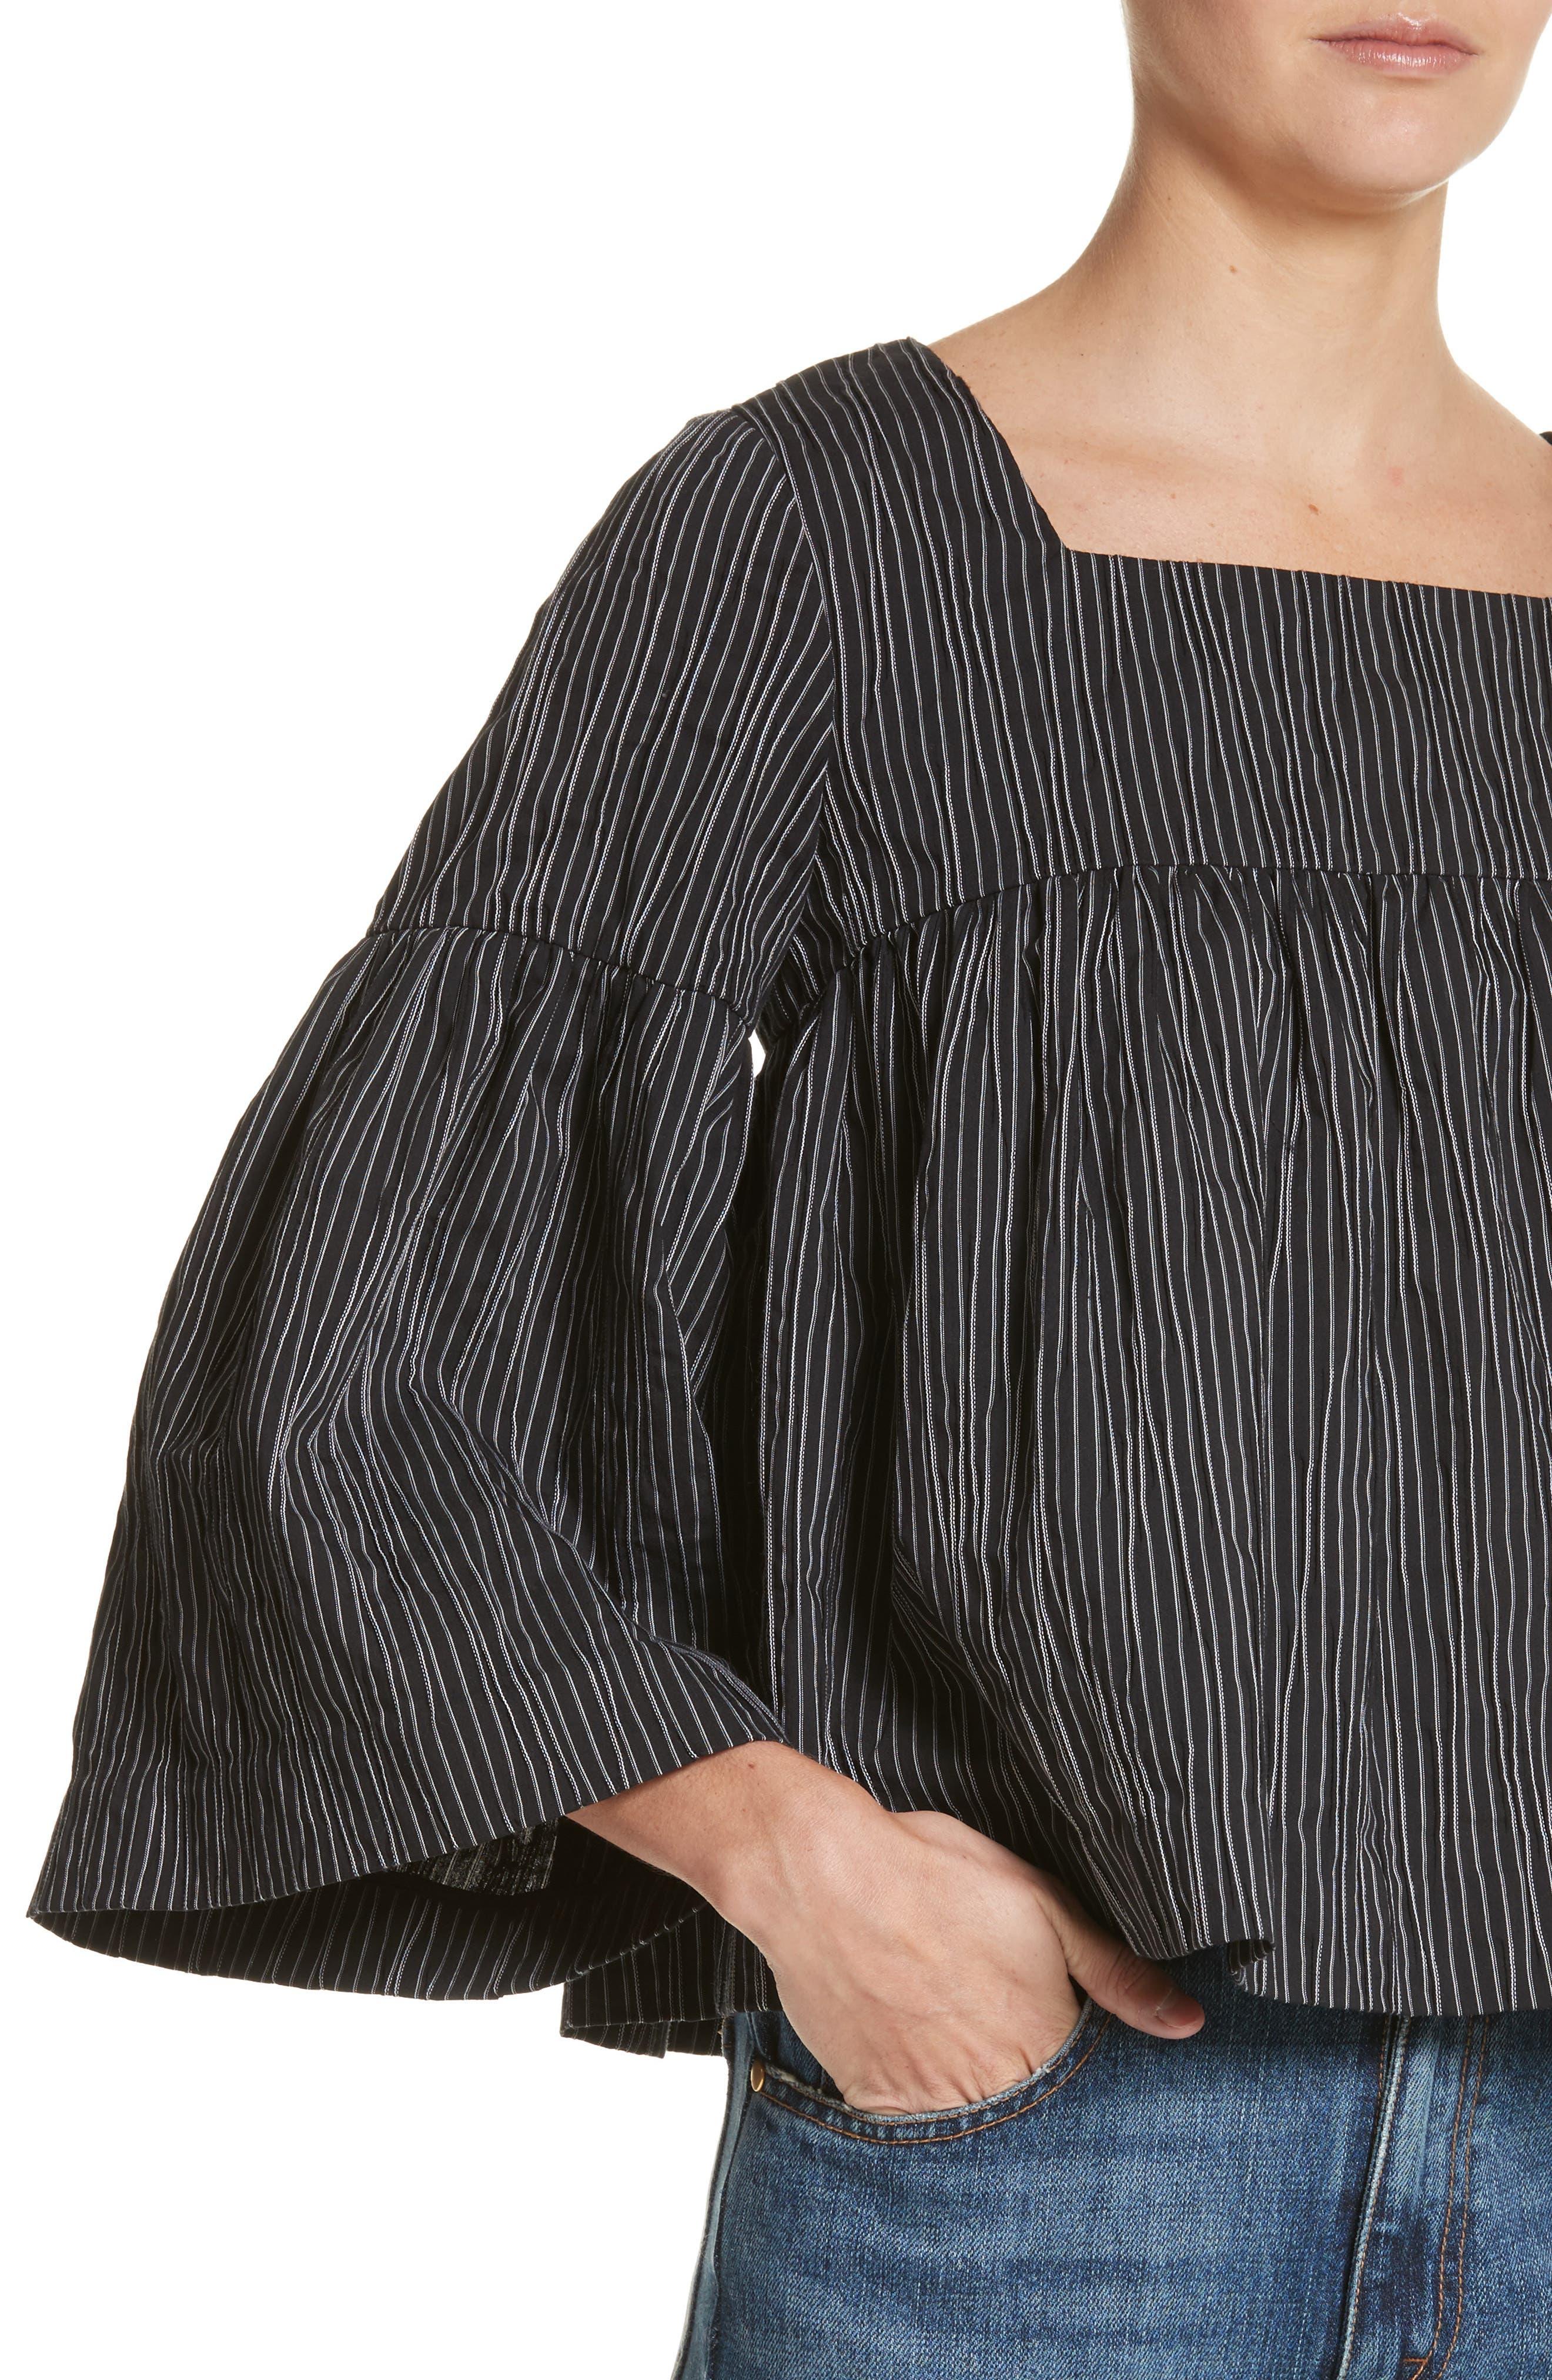 Stripe Crinkle Cotton Blend Swing Top,                             Alternate thumbnail 4, color,                             Black/ White Stripe